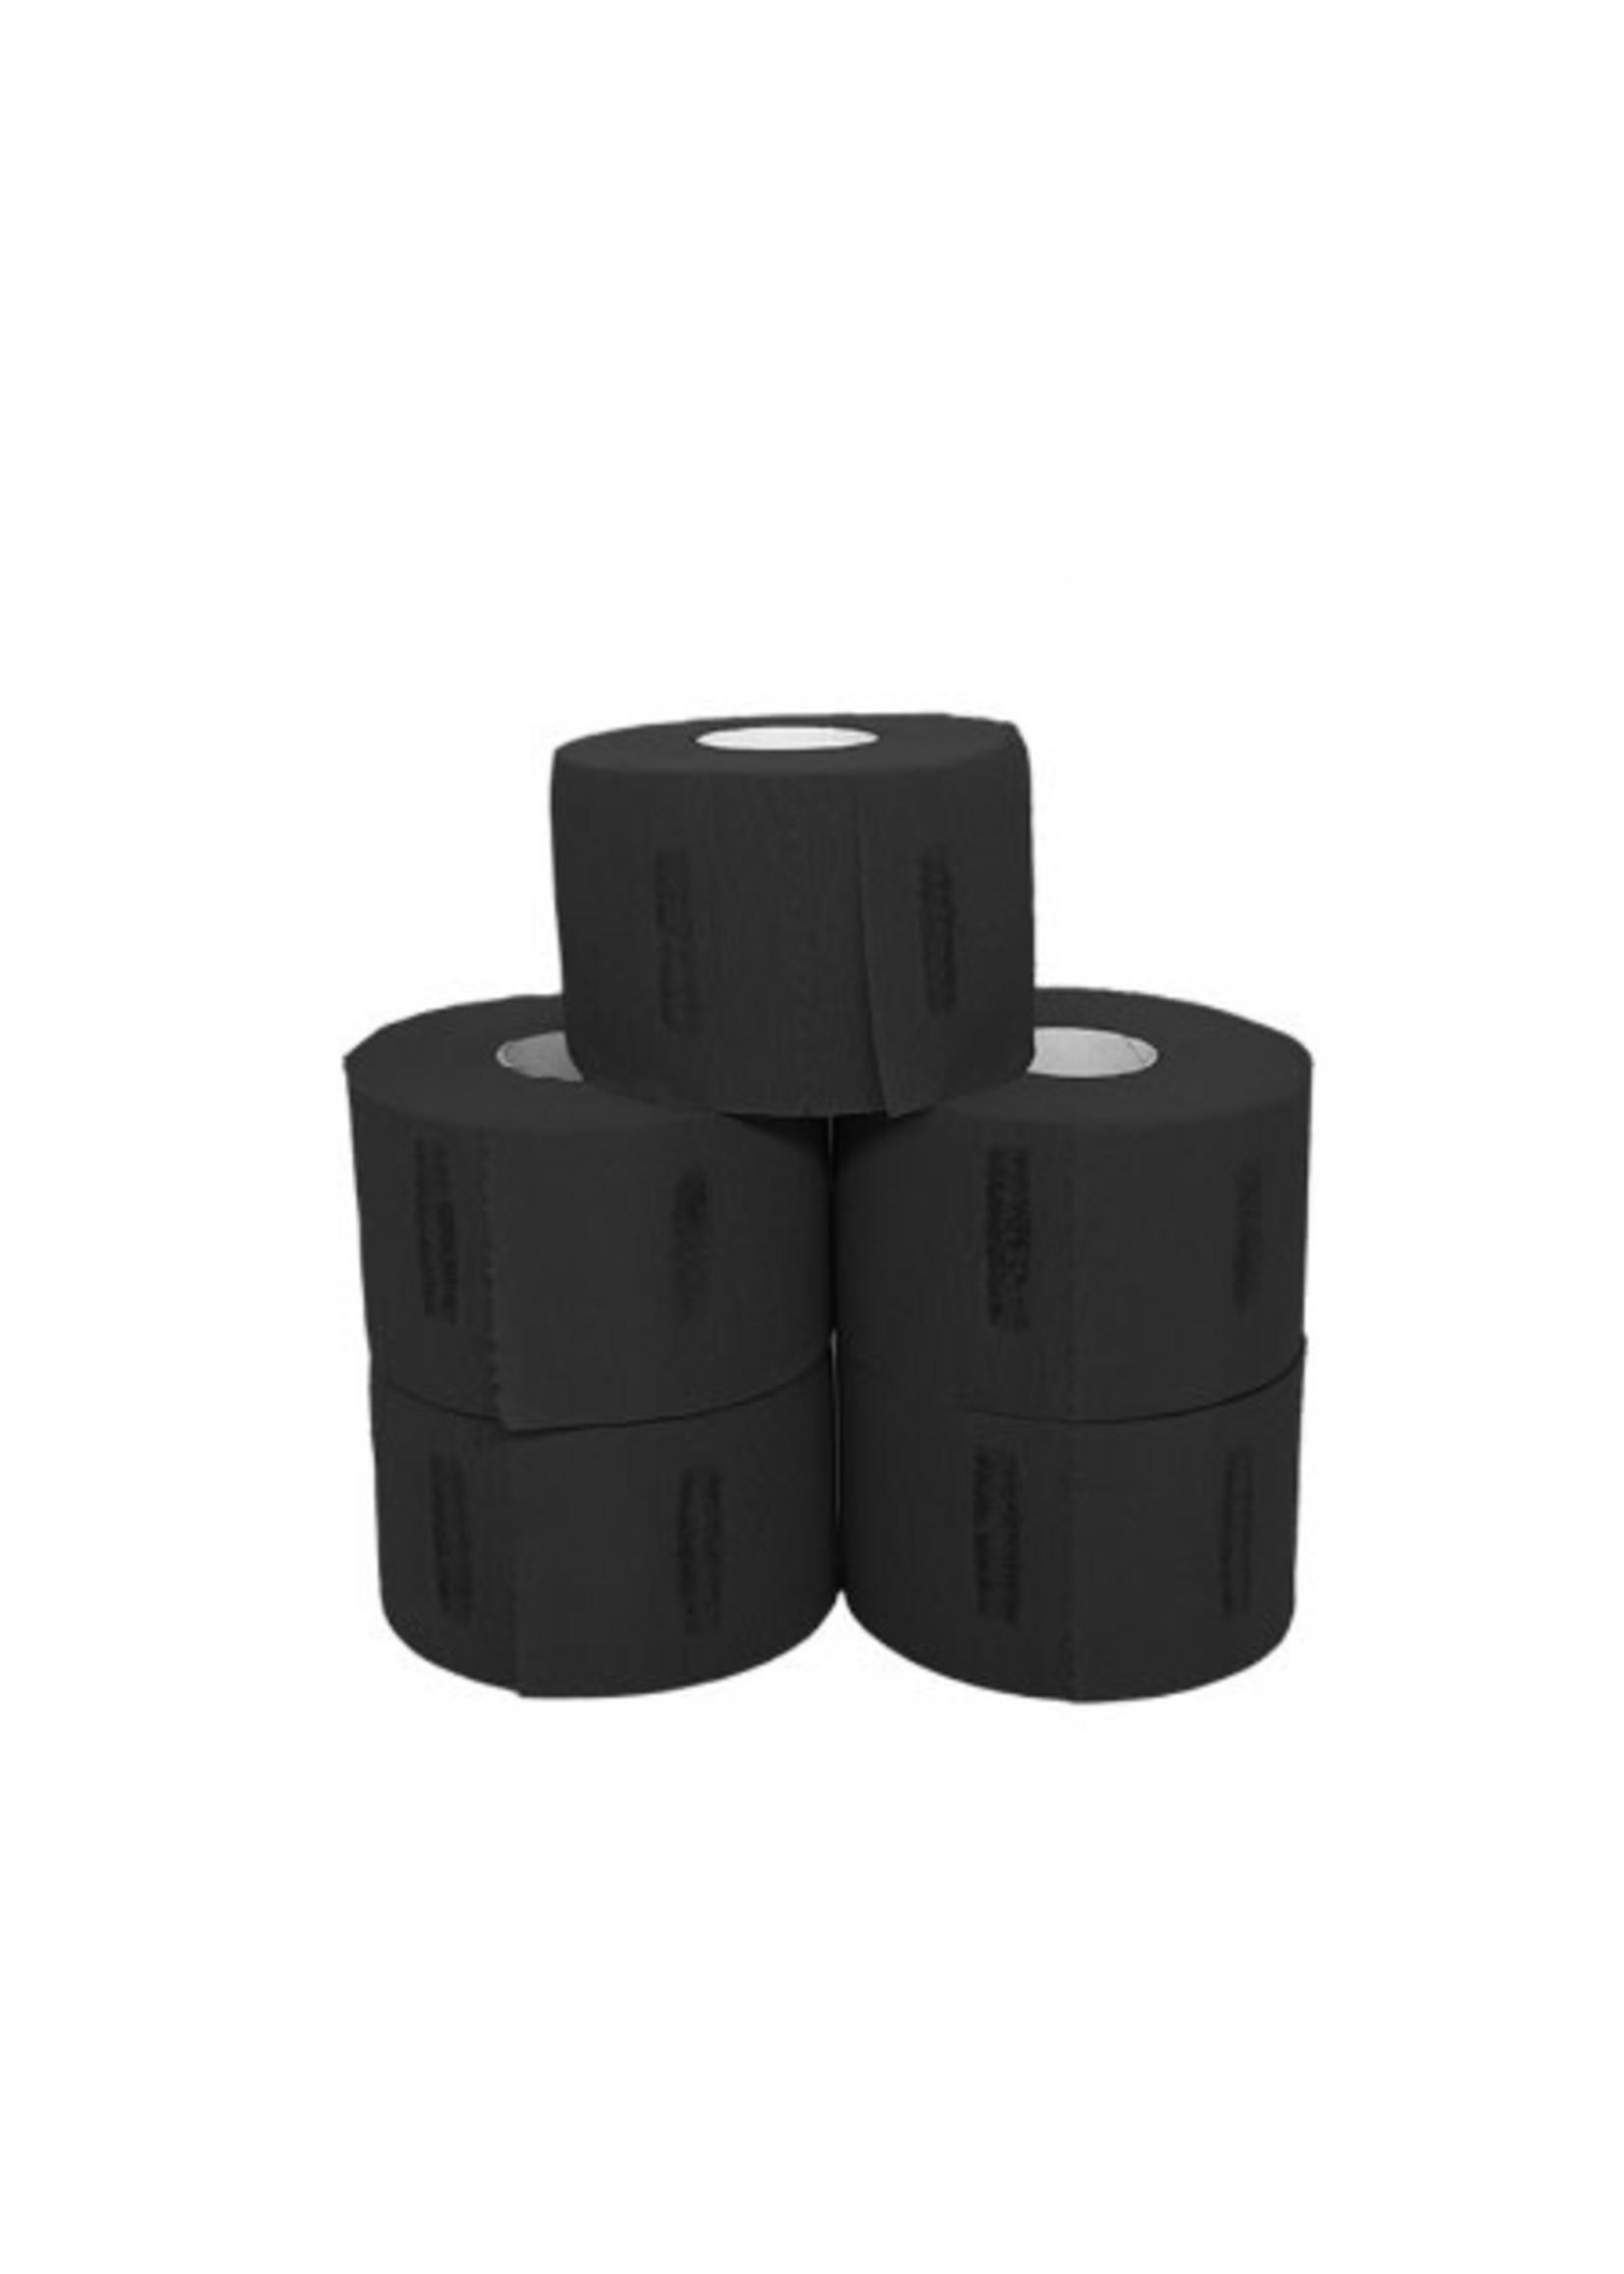 Level 3 L3-5 Rolls Neck Strips- Black